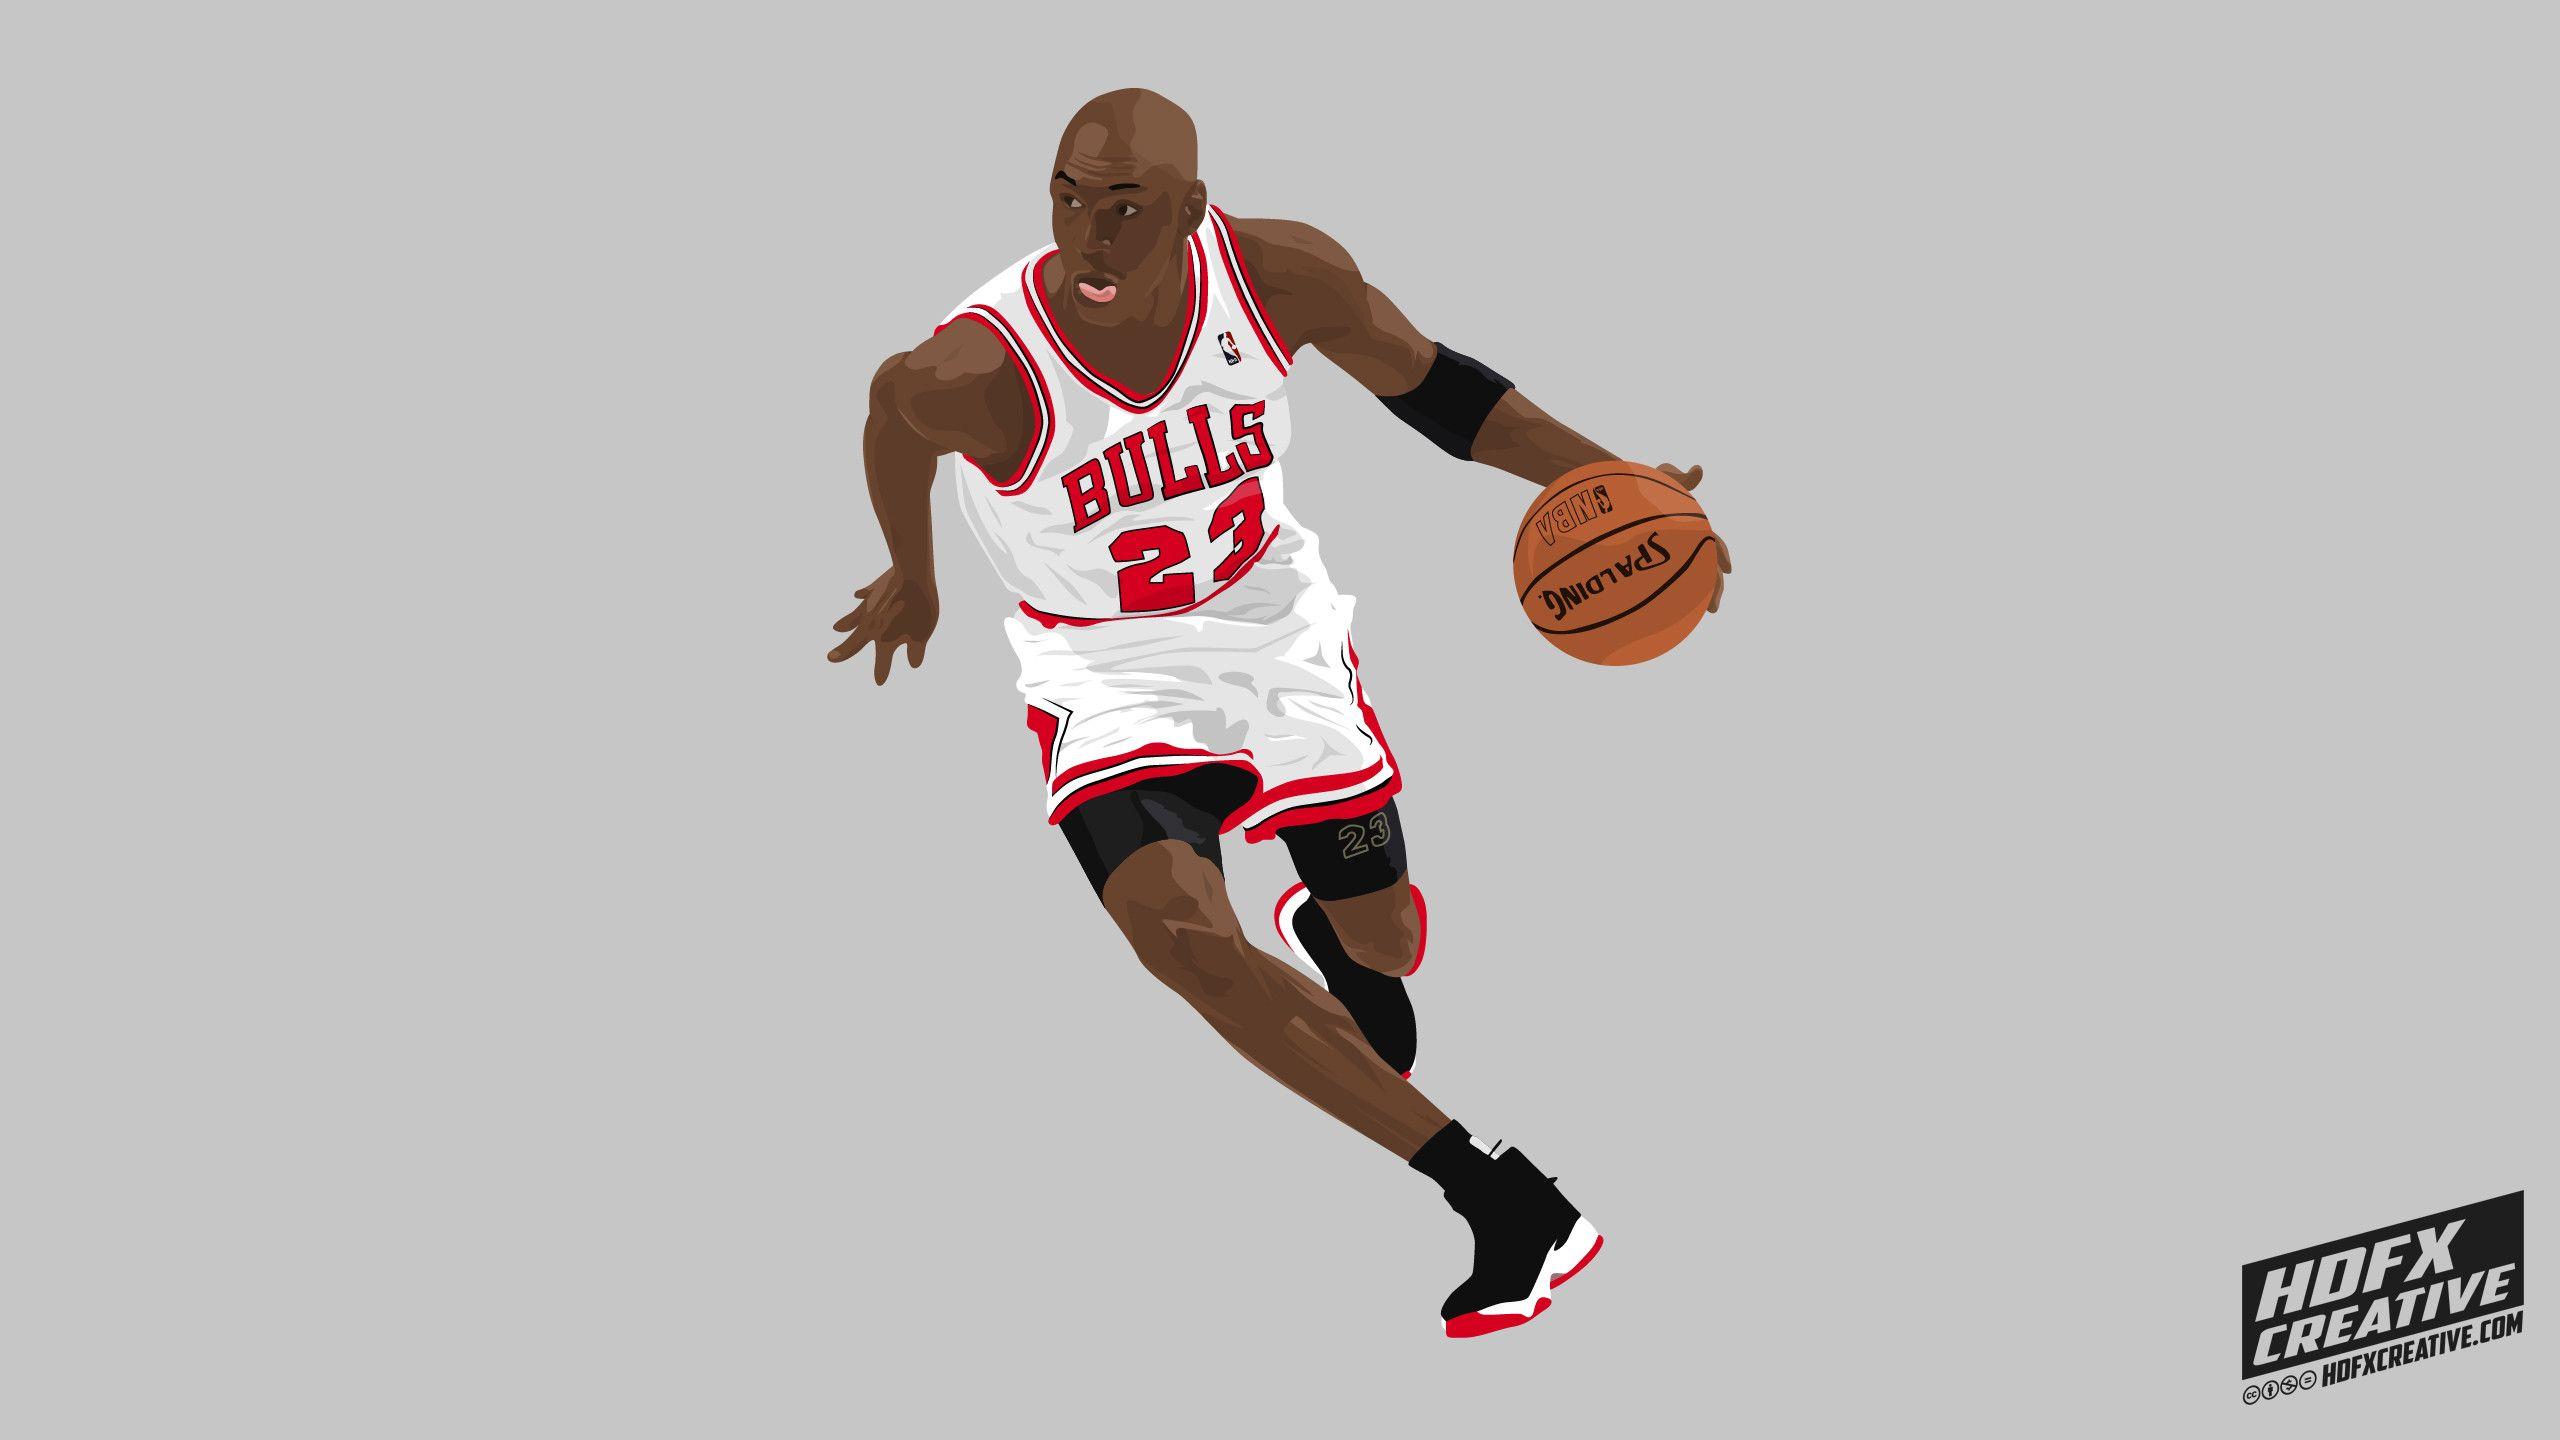 Michael Jordan Cartoon Wallpaper: [32+] Michael Jordan And Stephen Curry Wallpapers On